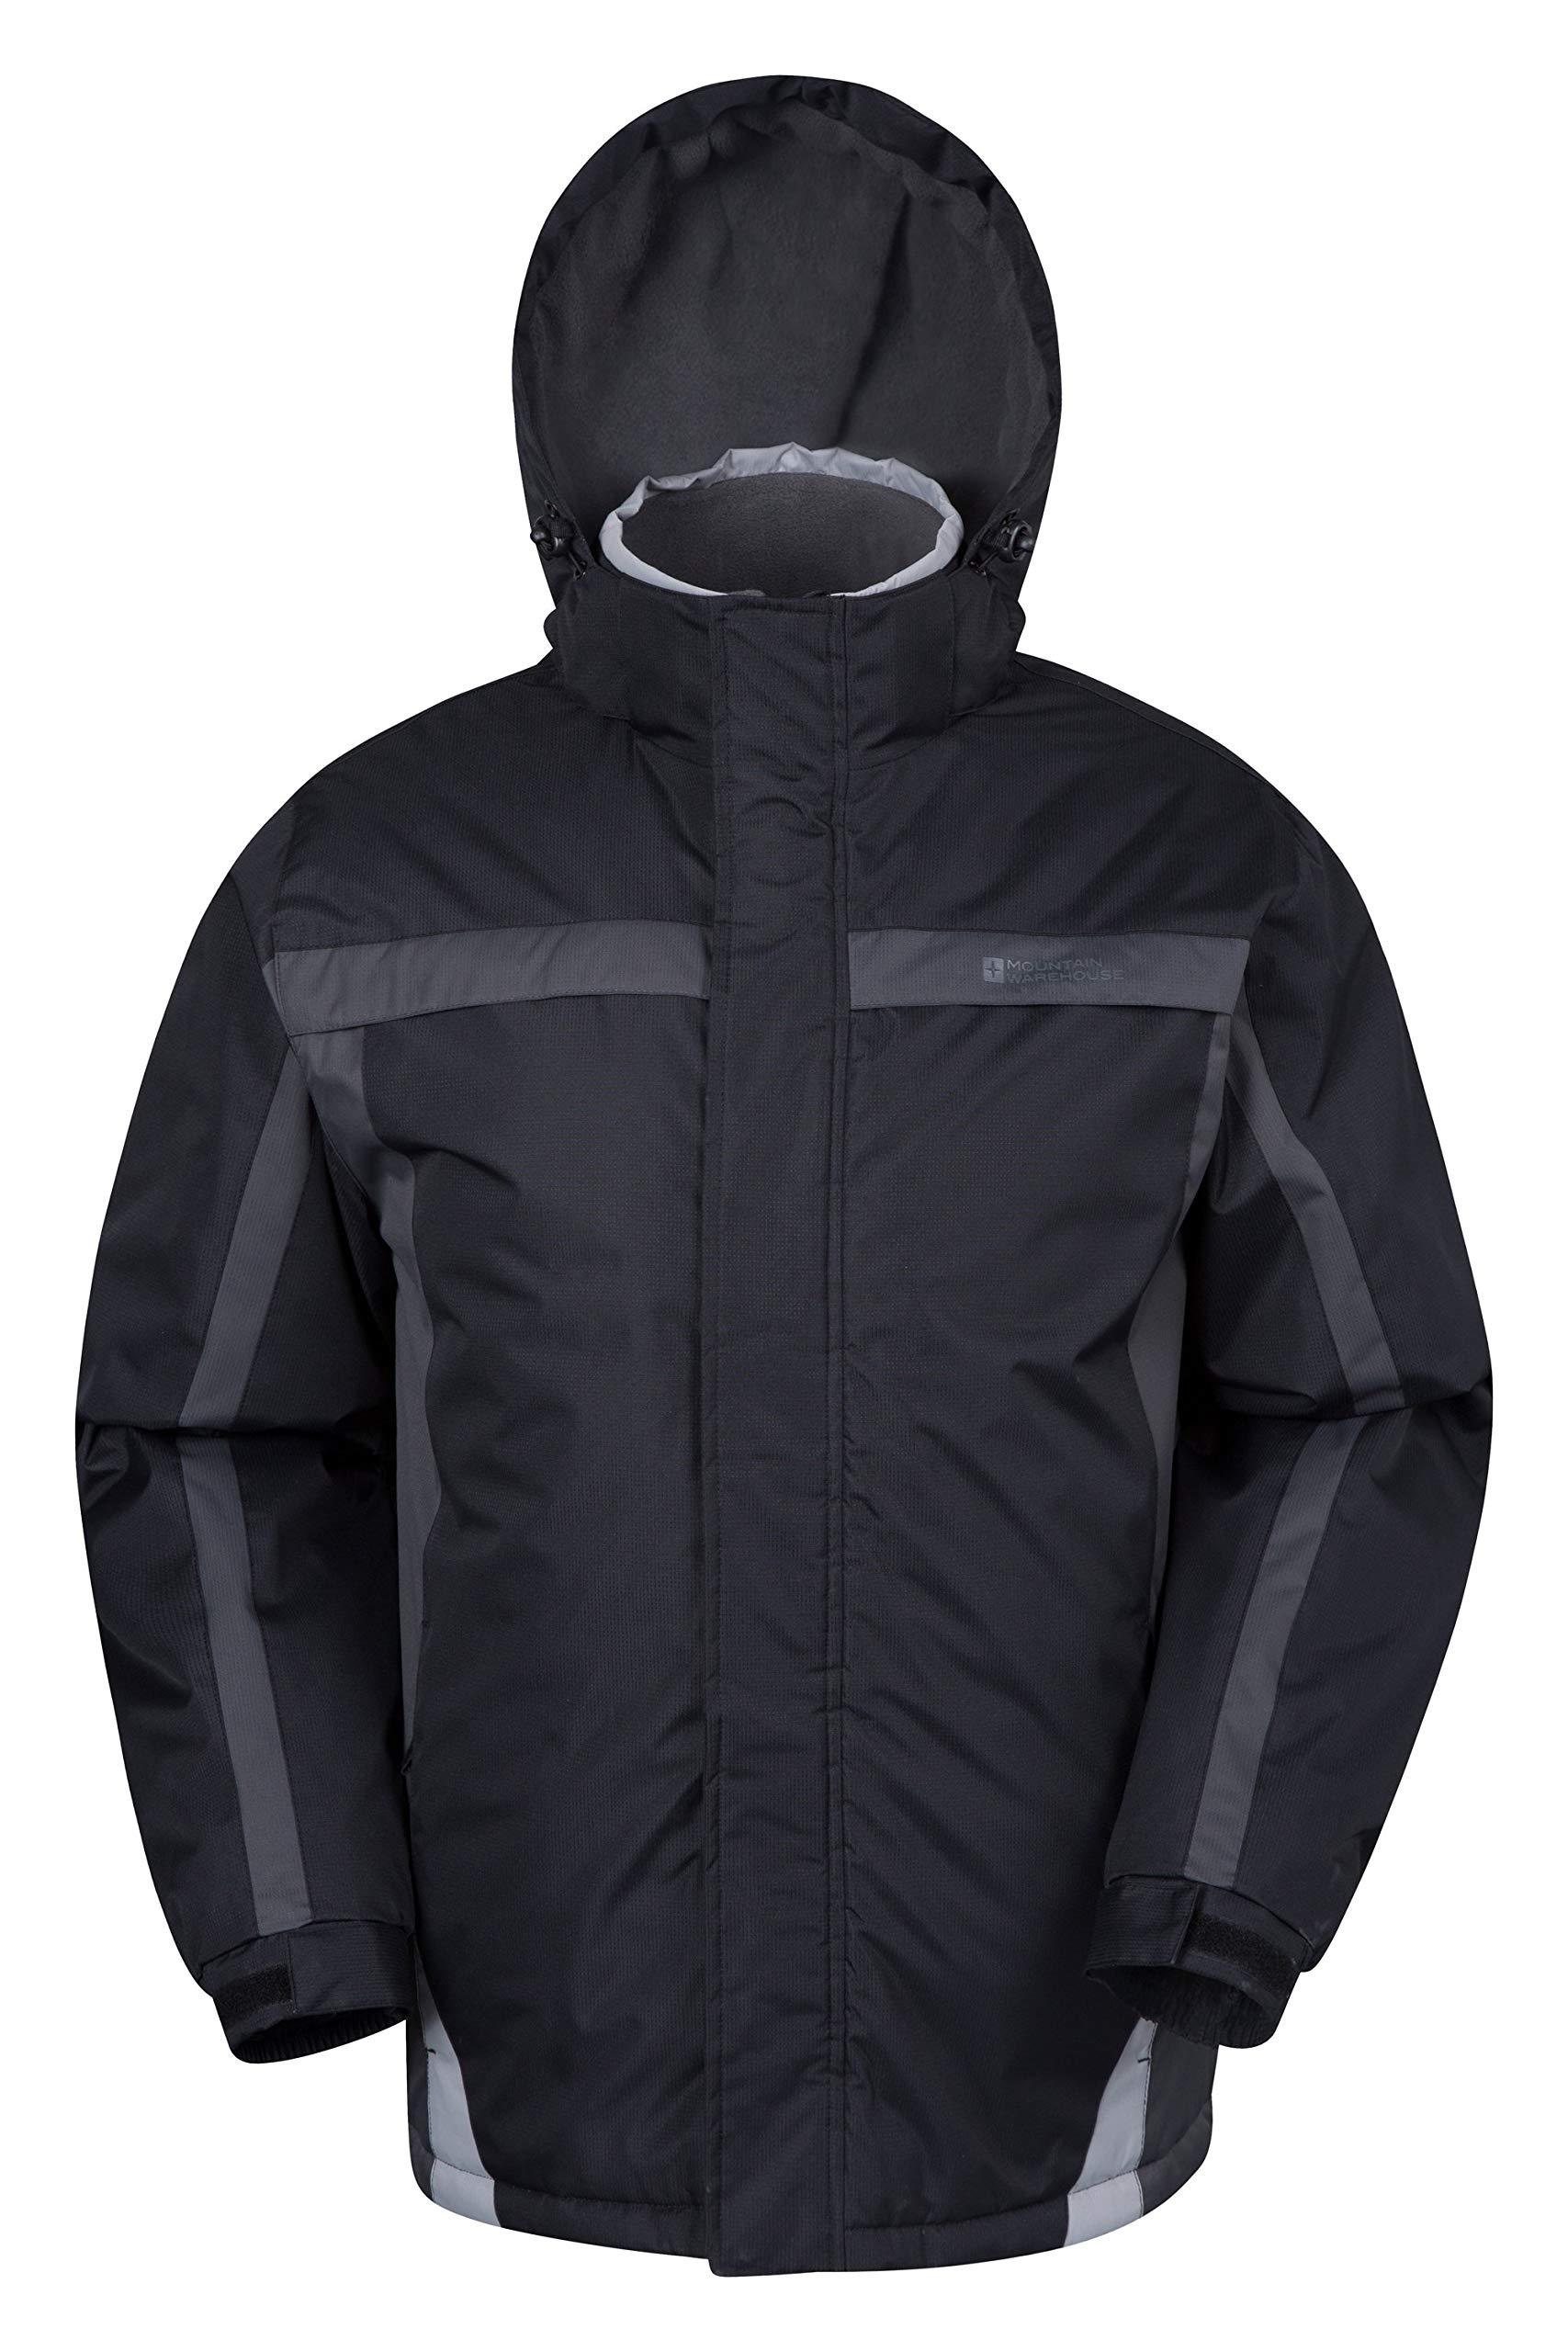 Mountain Warehouse Dusk Mens Ski Jacket - Water Resistant Winter Coat Black Small by Mountain Warehouse